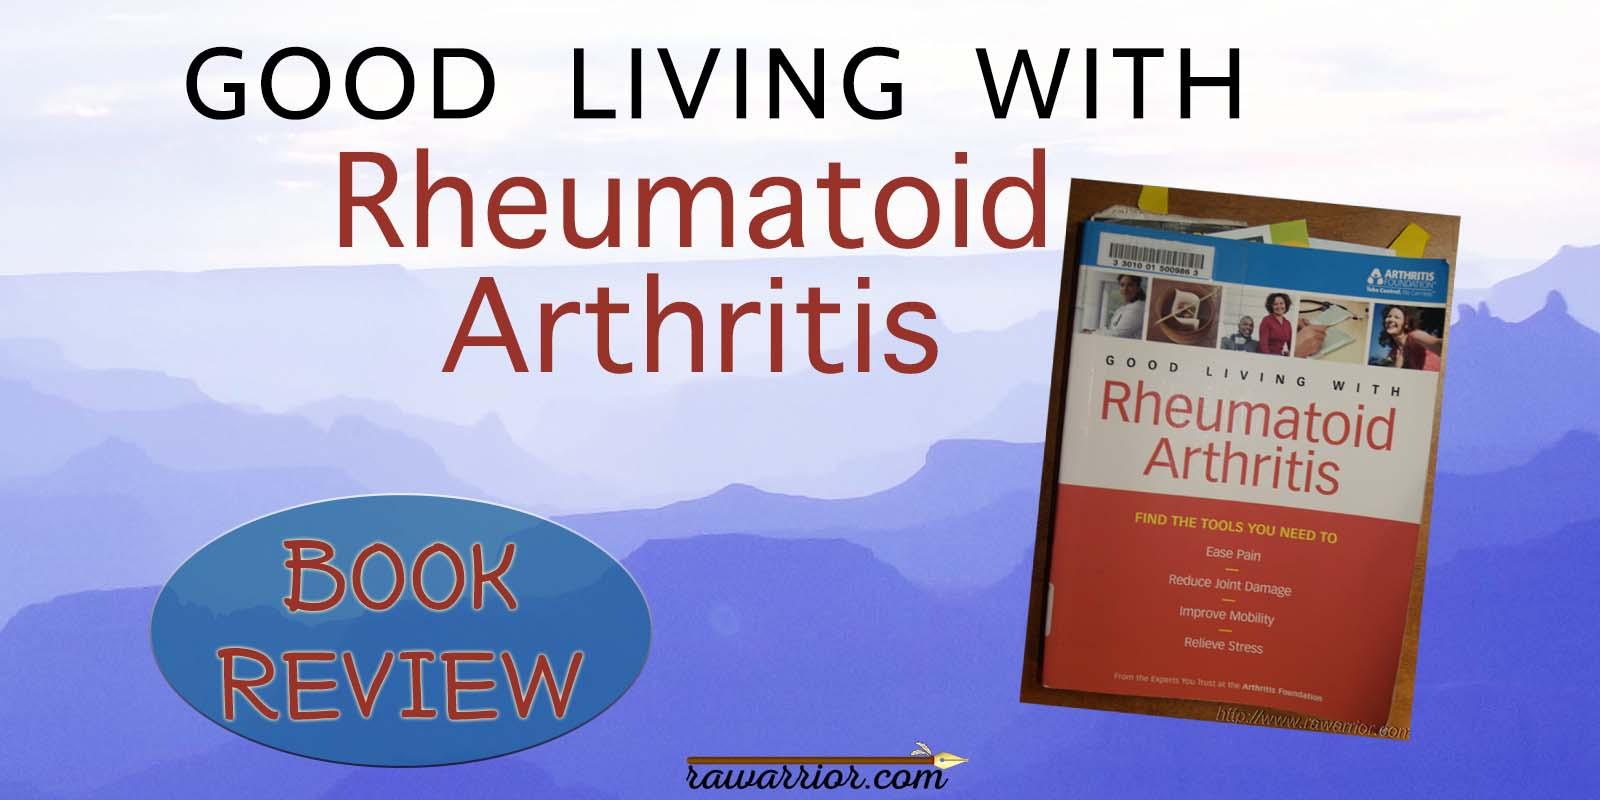 Good Living with Rheumatoid Arthritis